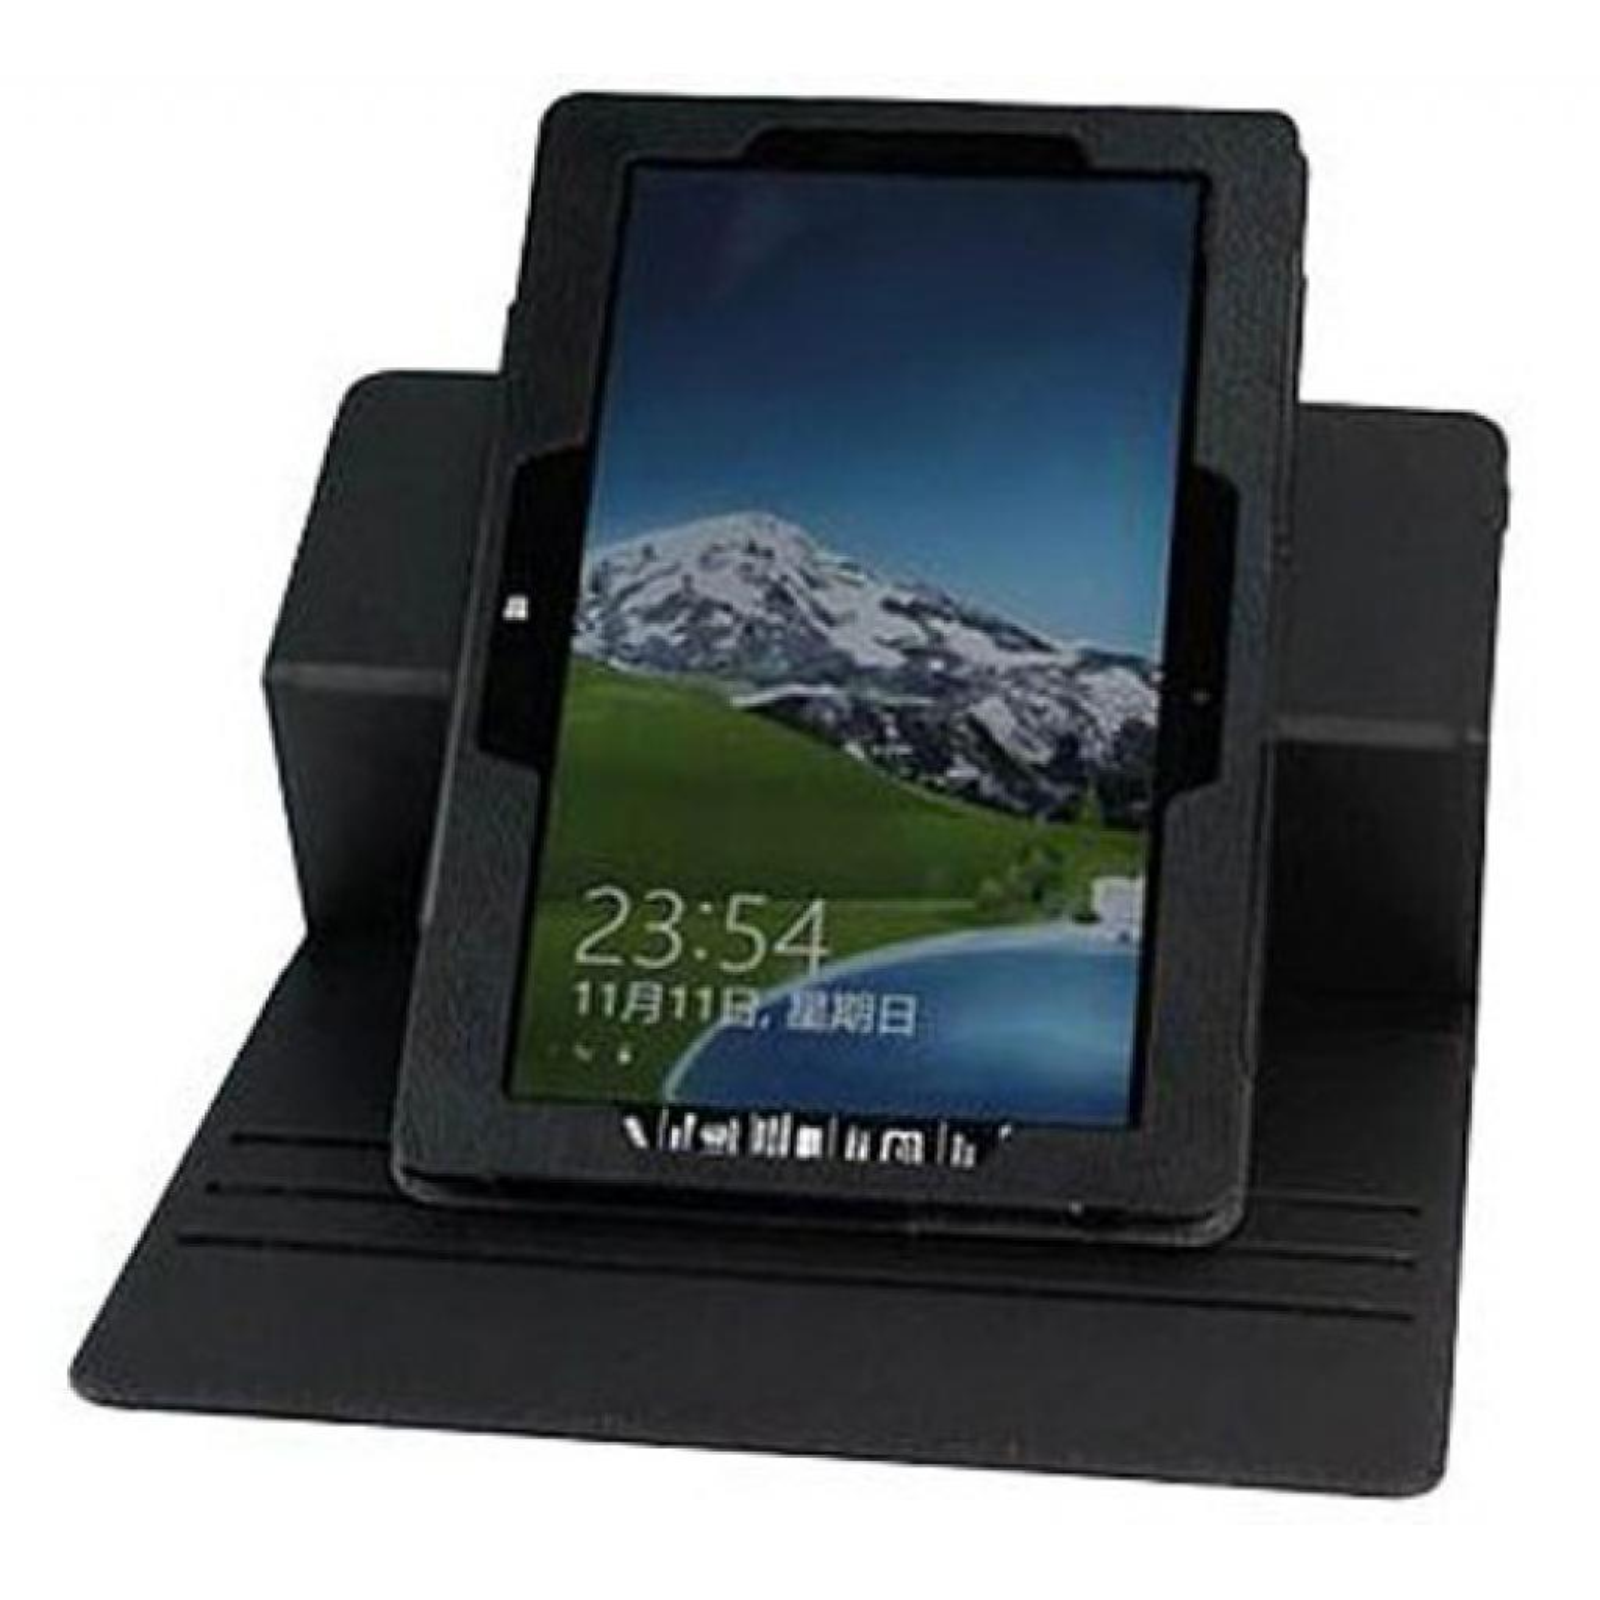 Чехол для планшета Pro-case ASUS VivoTab Smart ME400 rotate (ME400 rot) изображение 3